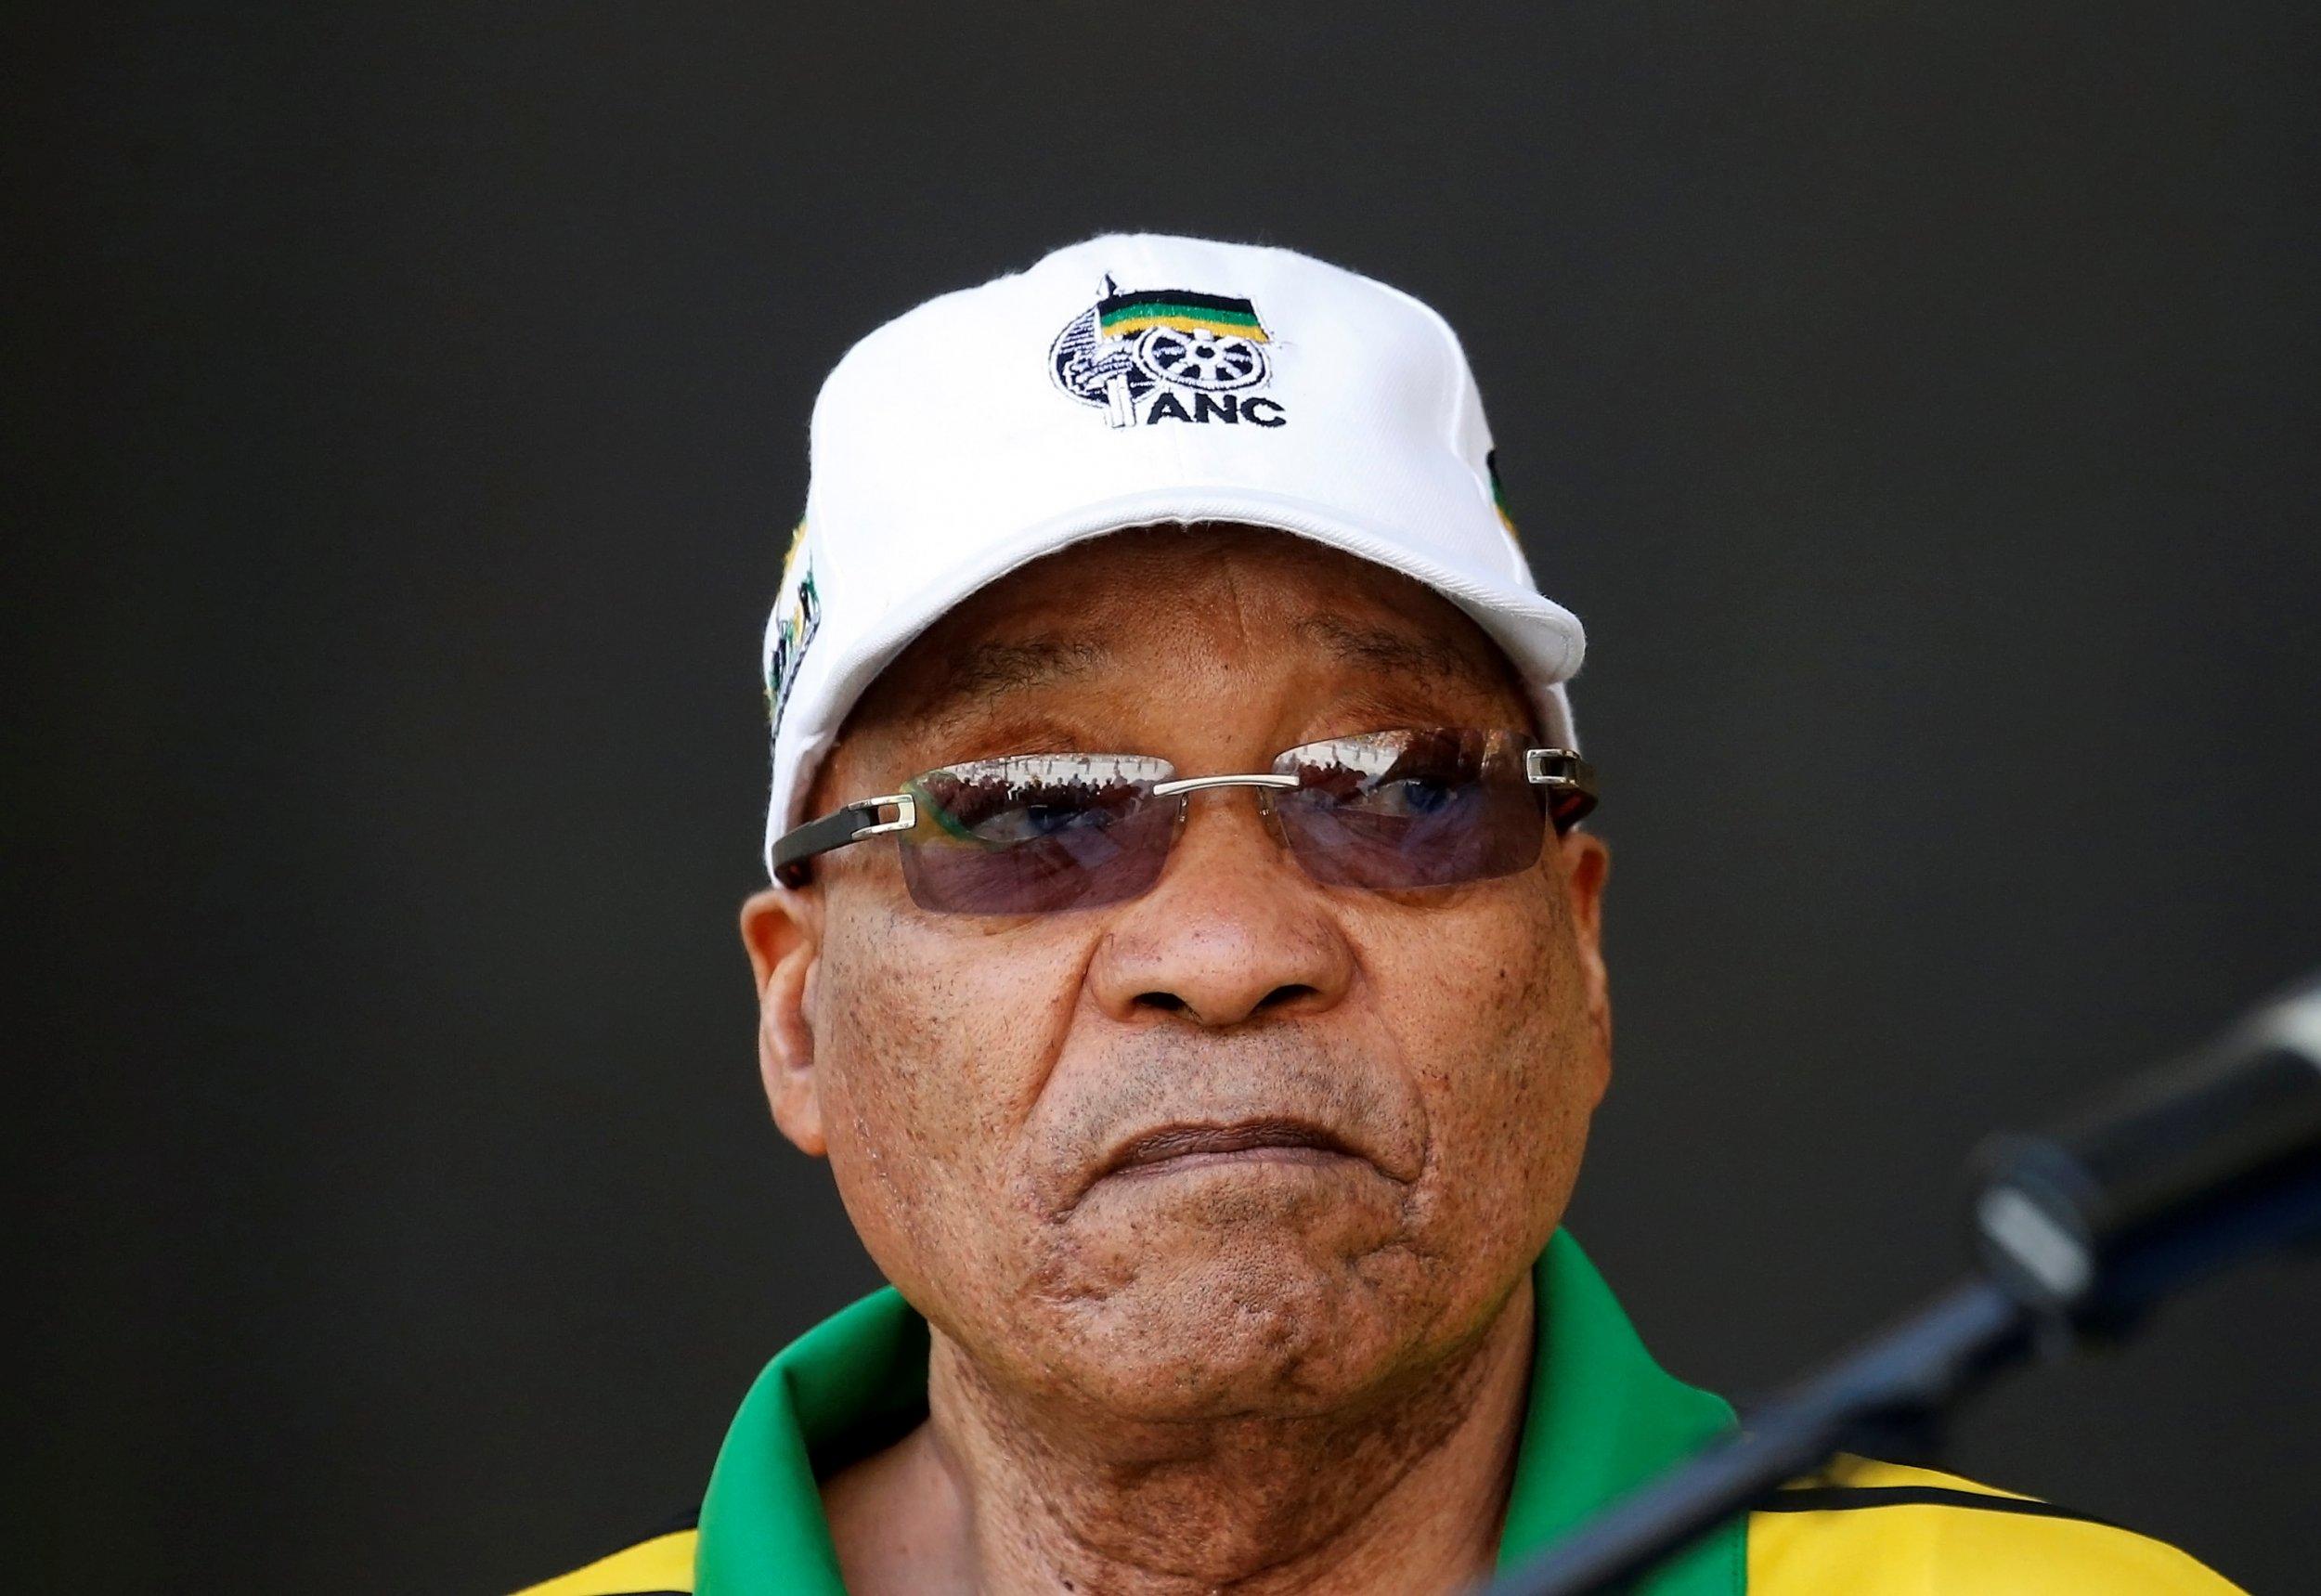 South Africa: President Jacob Zuma Pulls Bid to Block Corruption Report